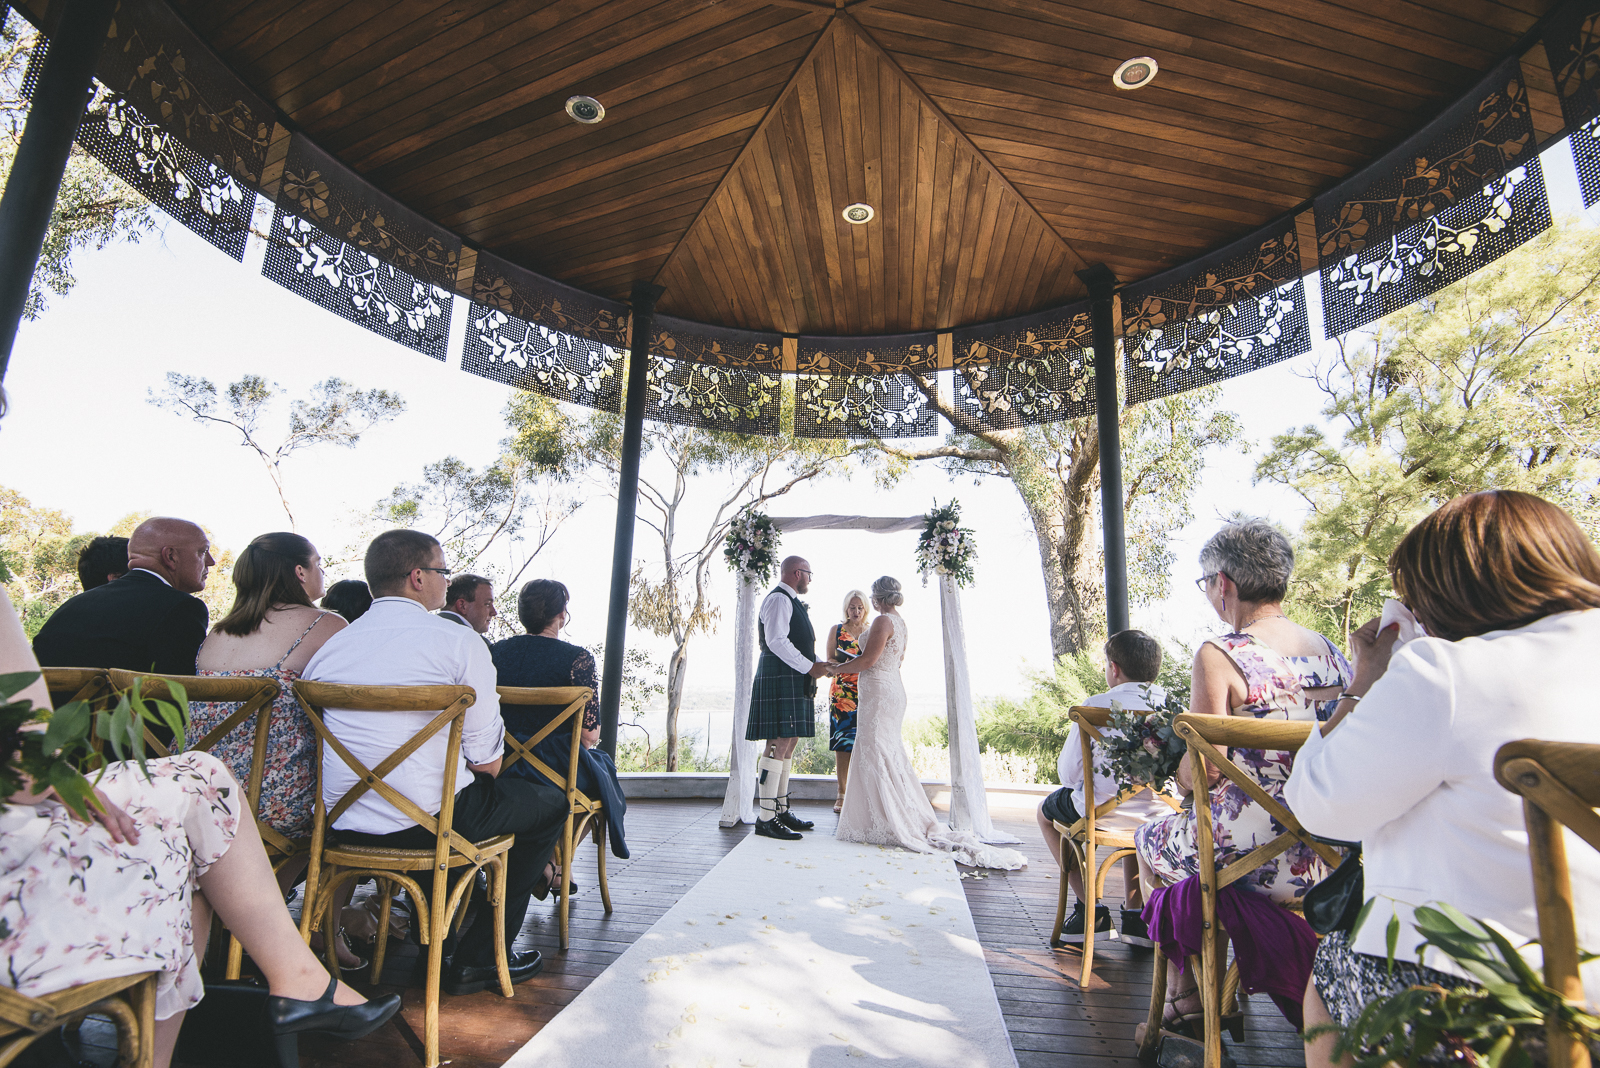 Kings Park Marlee Pavillion Wedding Ceremony